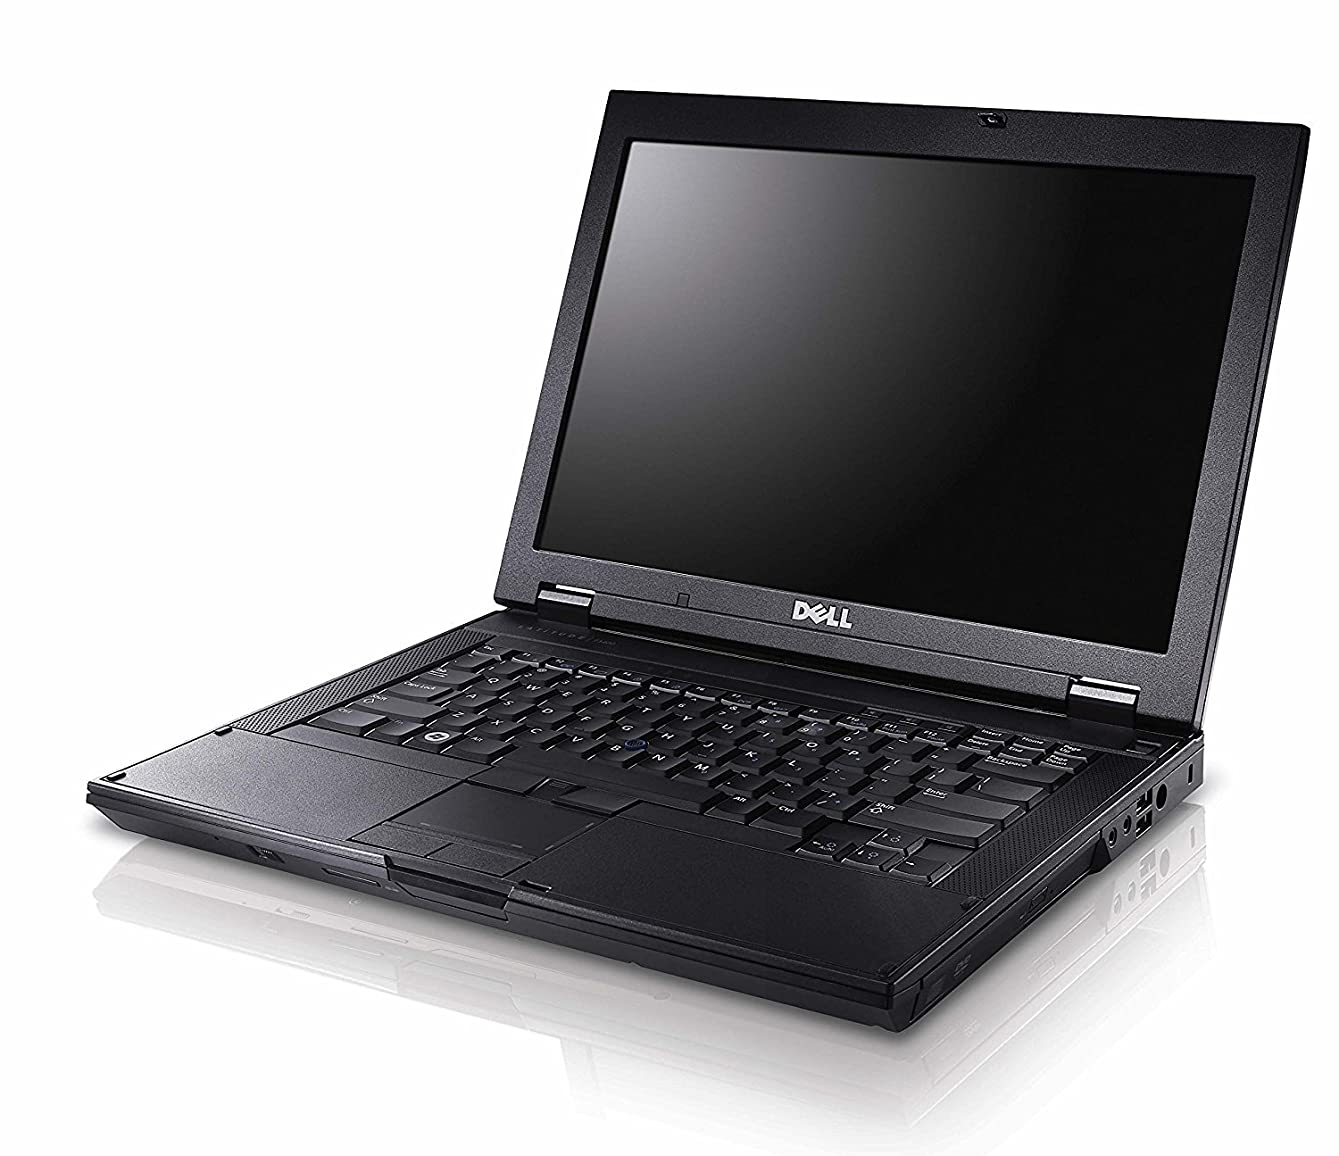 Dell Laptop 14 Inch E5400 Intel P8400 2.26GHz 2GB DDR2 Ram 160GB Hard Drive DVD Windows 10 (Renewed) kapztu756287